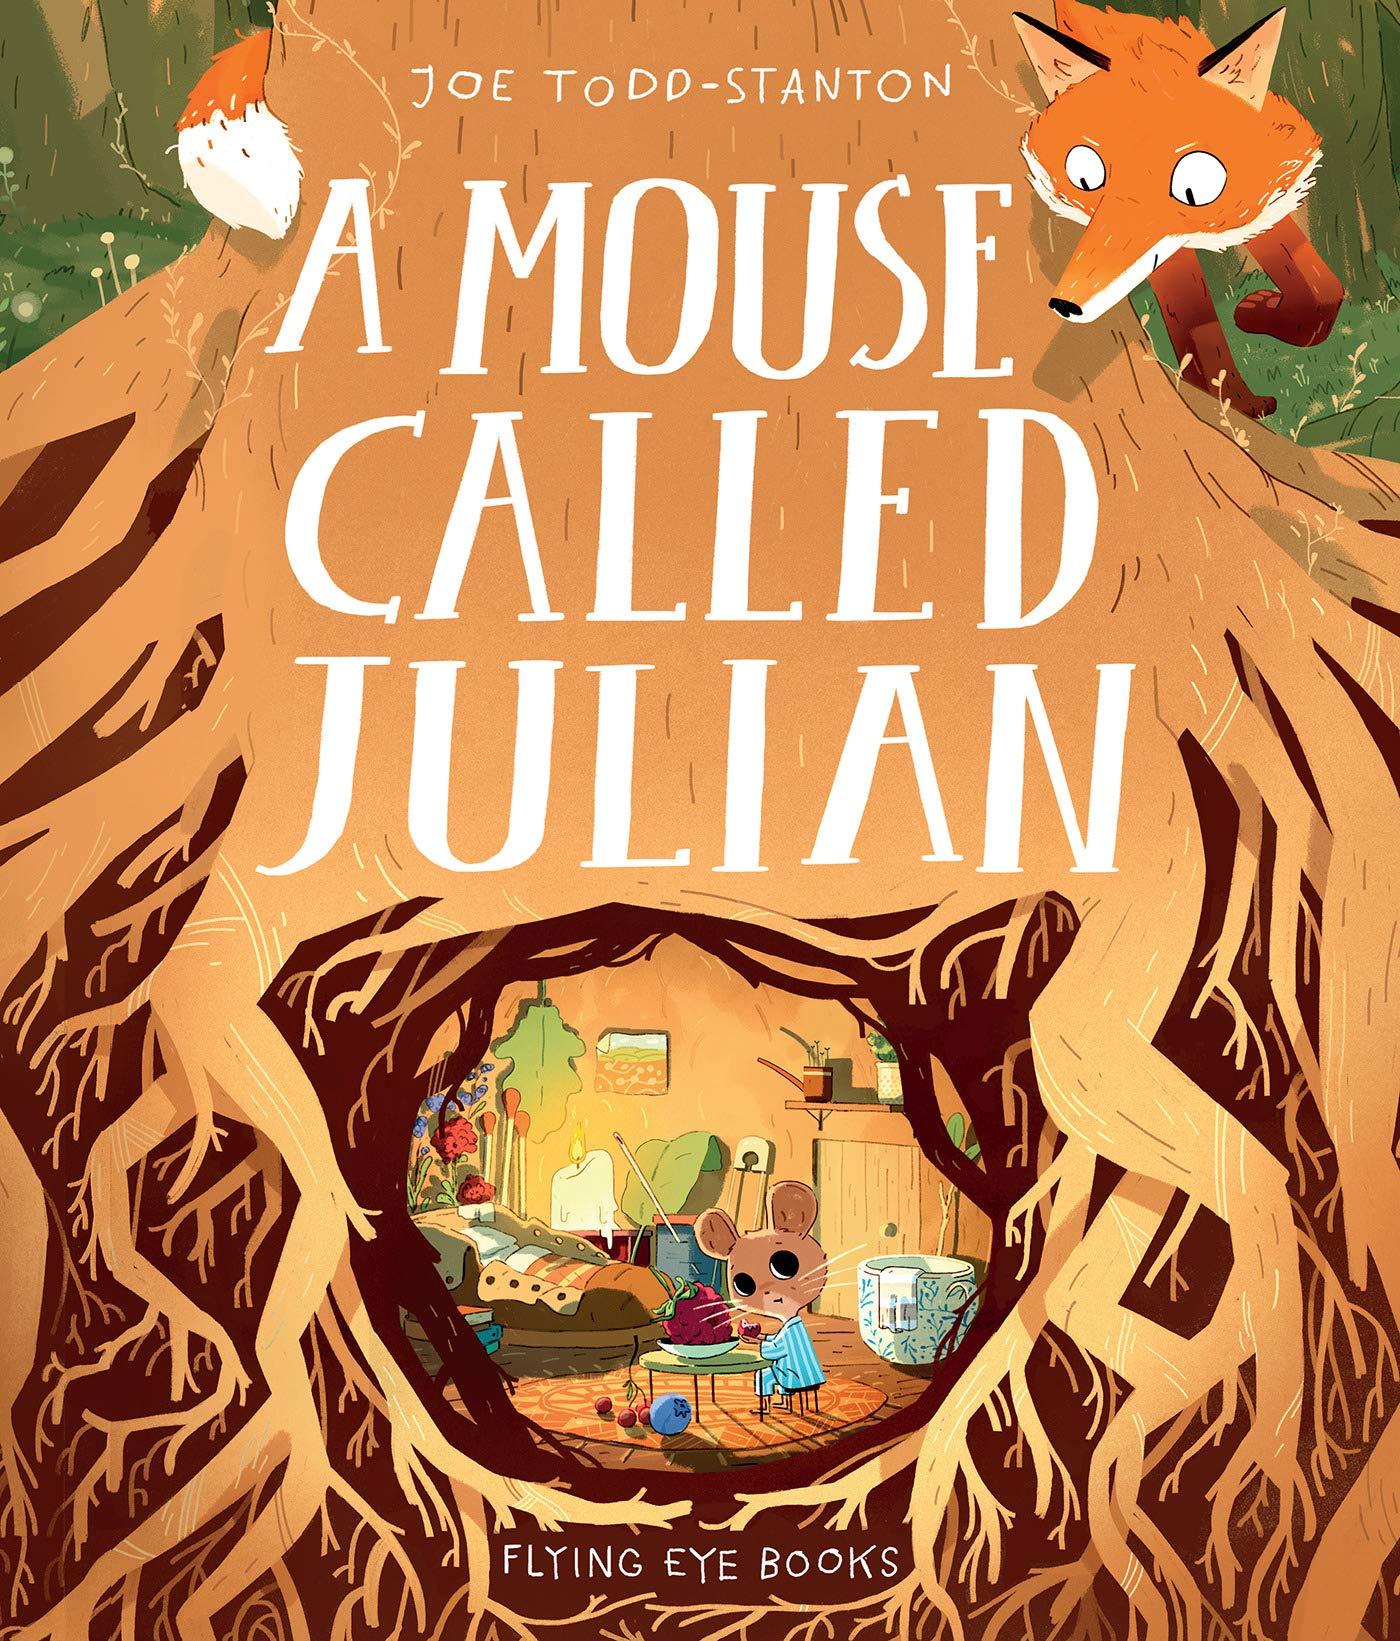 A Mouse Called Julian: Amazon.co.uk: Joe Todd Stanton: Books